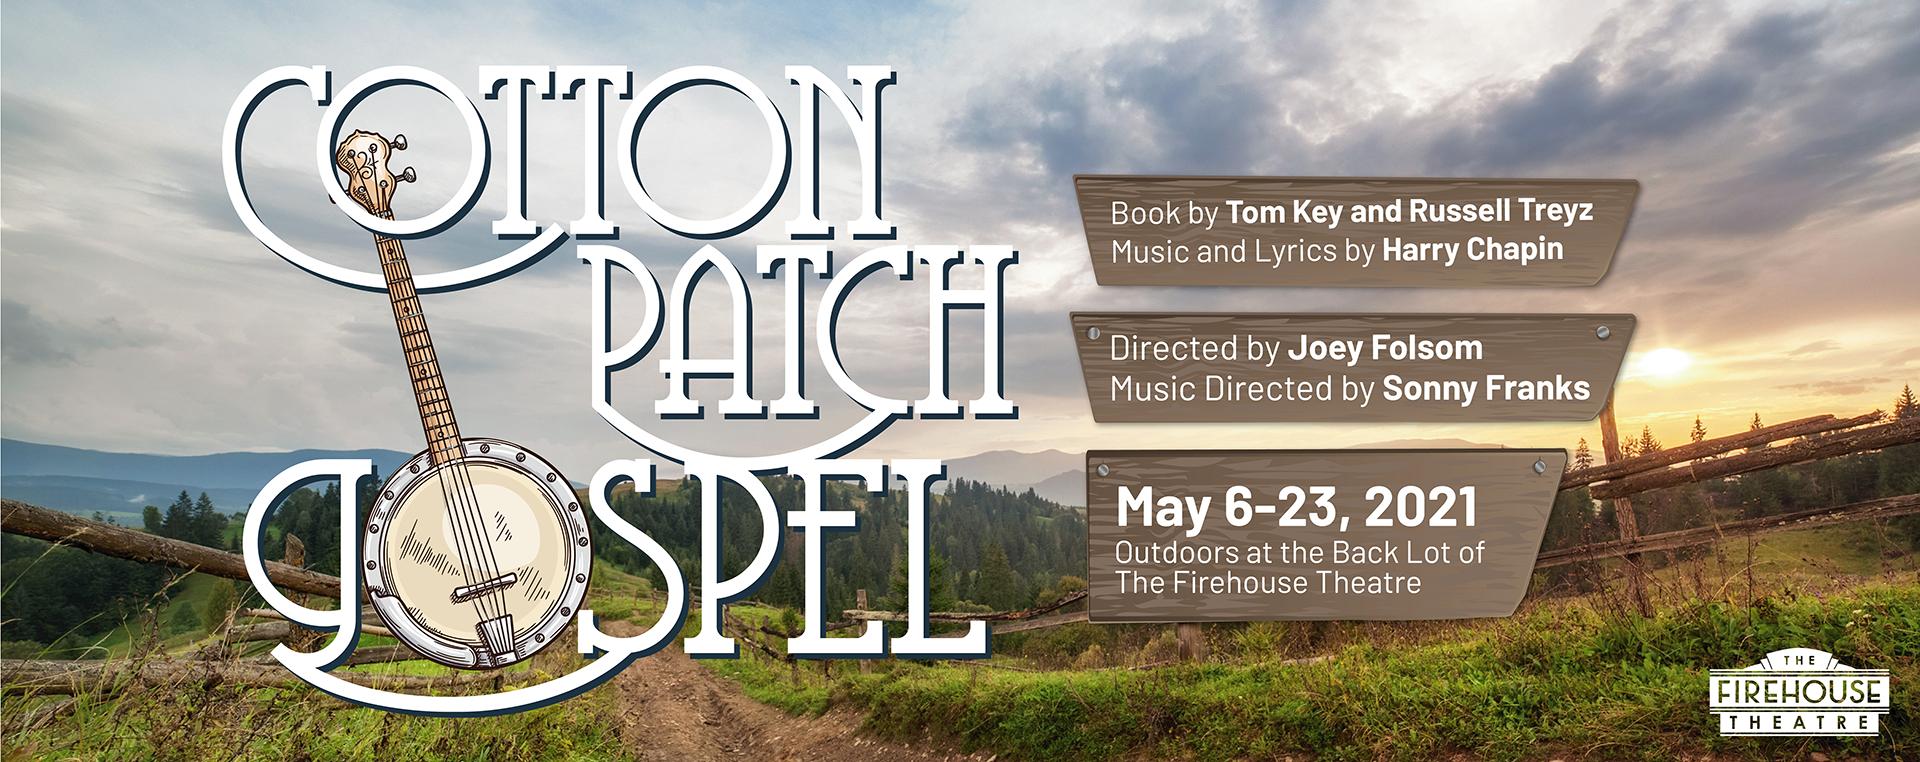 Cotton Patch Gospel, The Firehouse Theatre